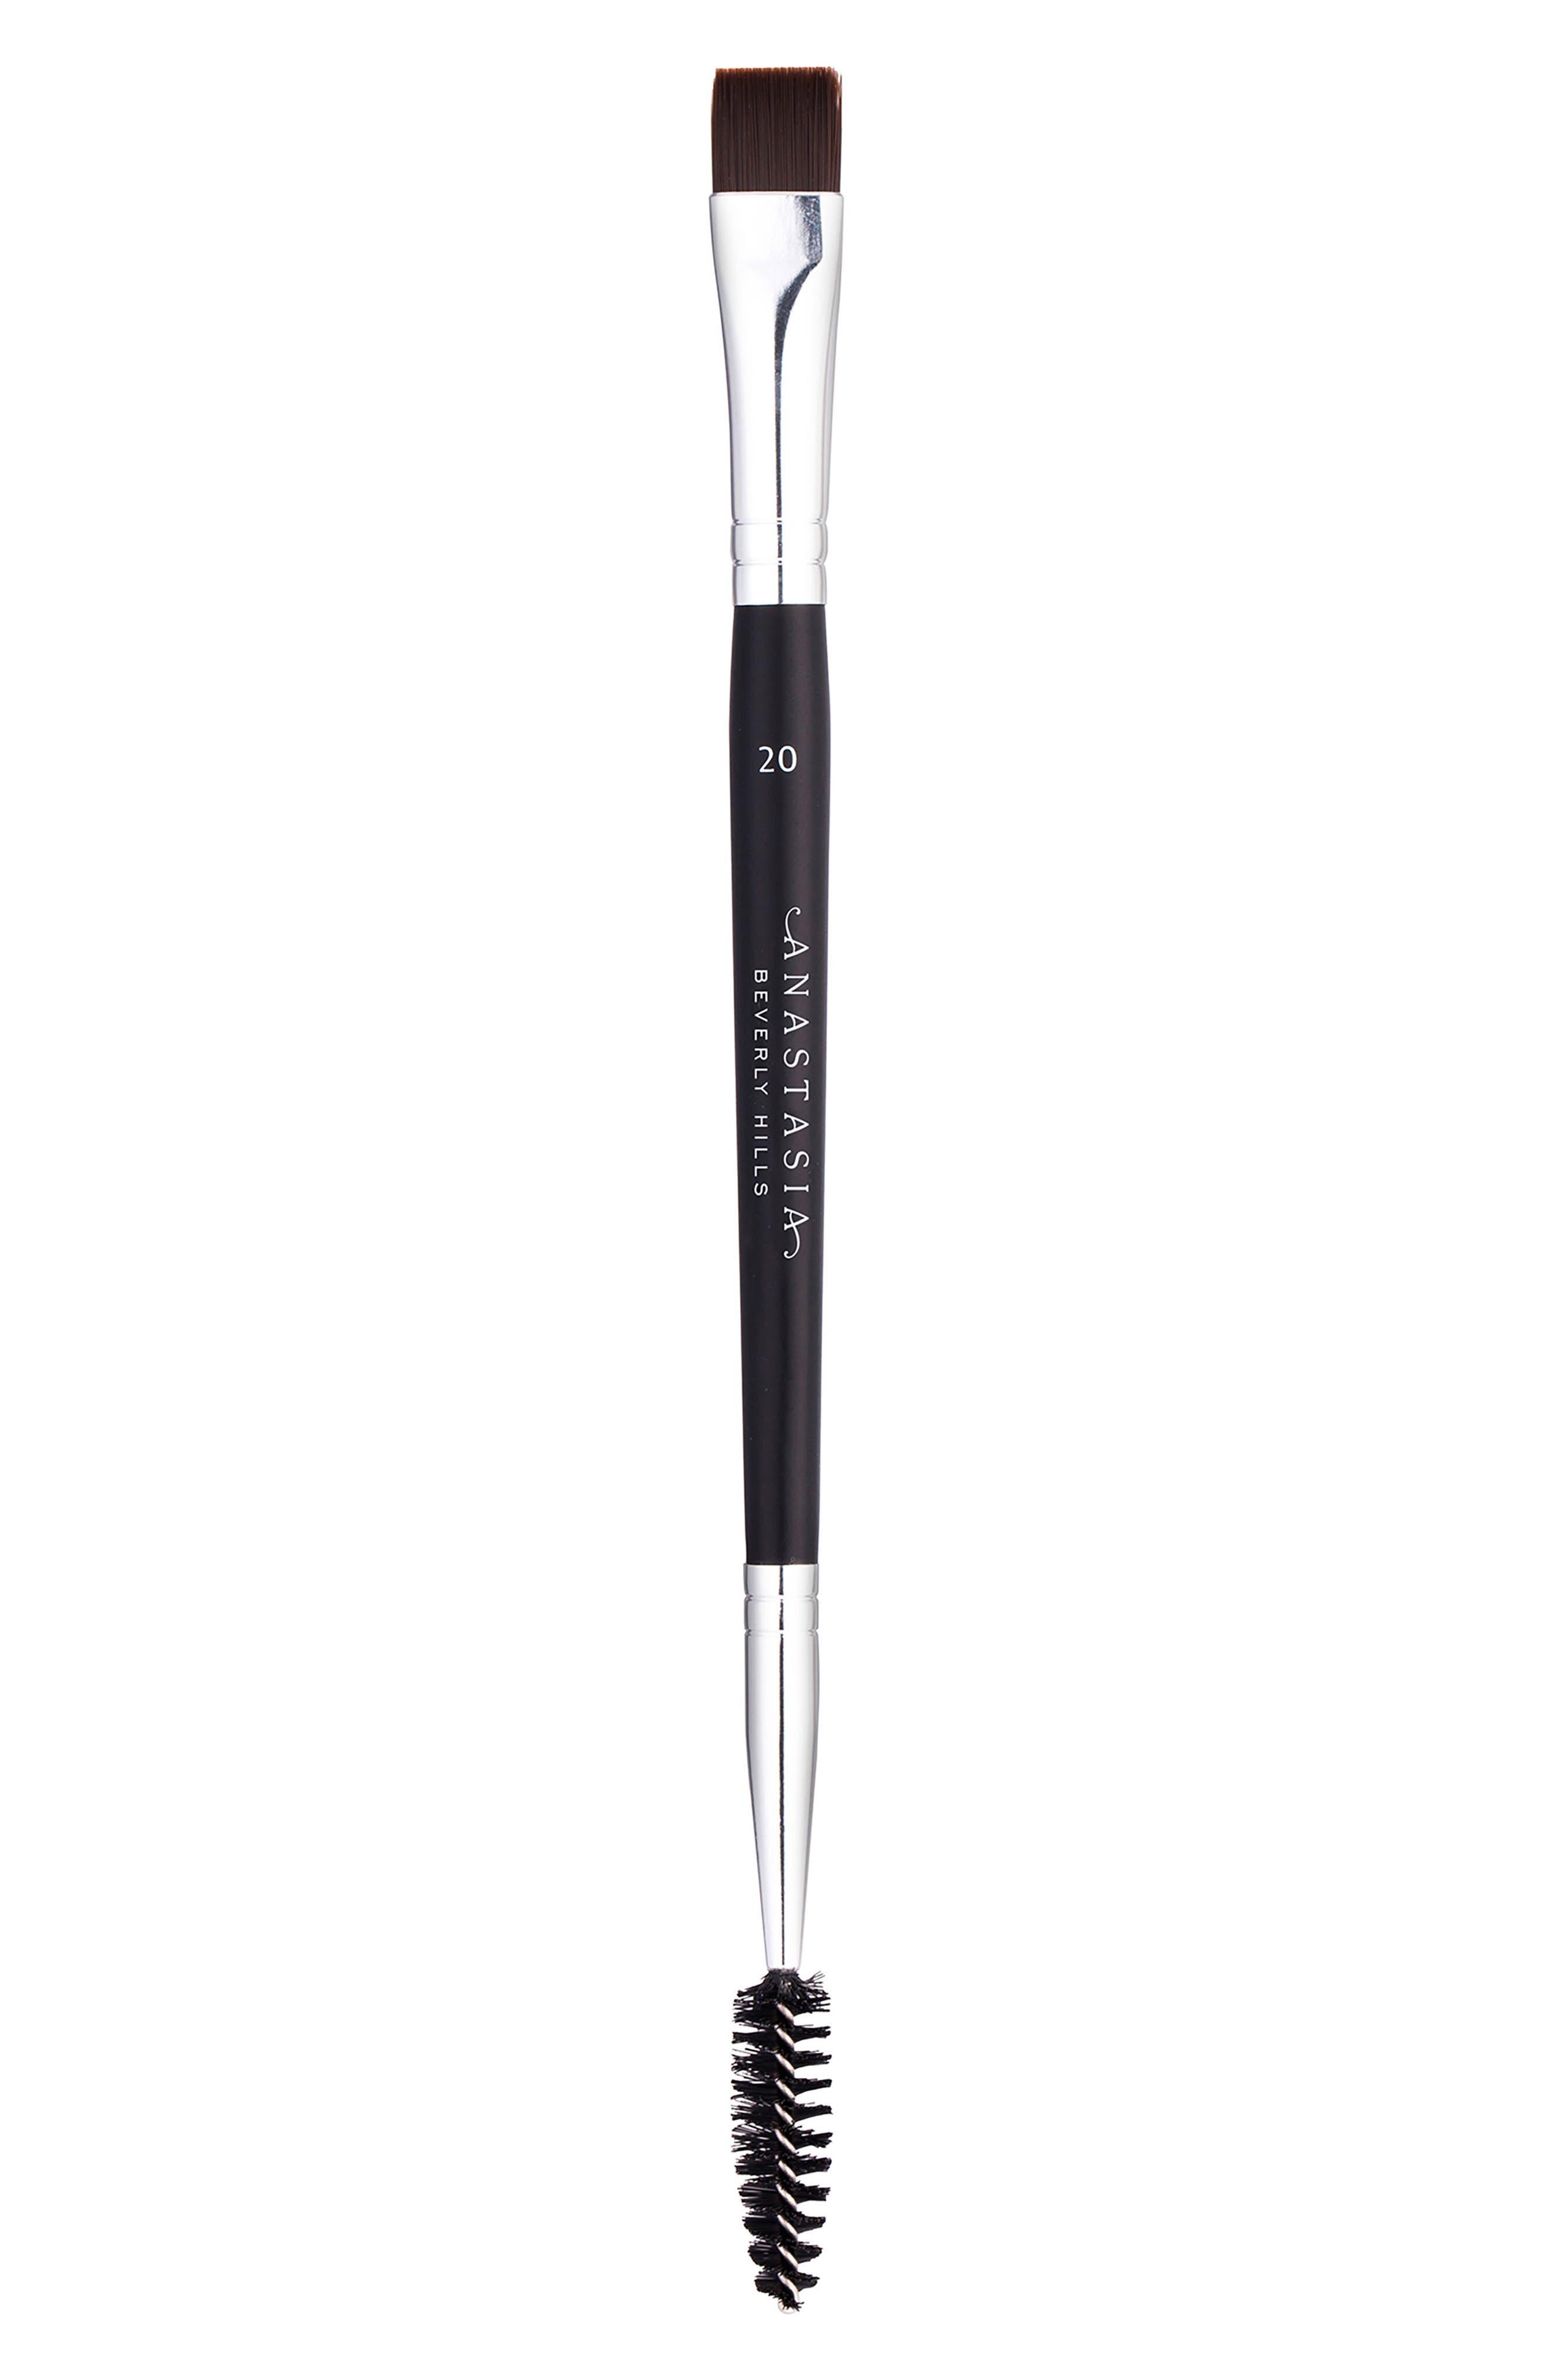 #20 Dual Ended Brow & Eyeliner Brush